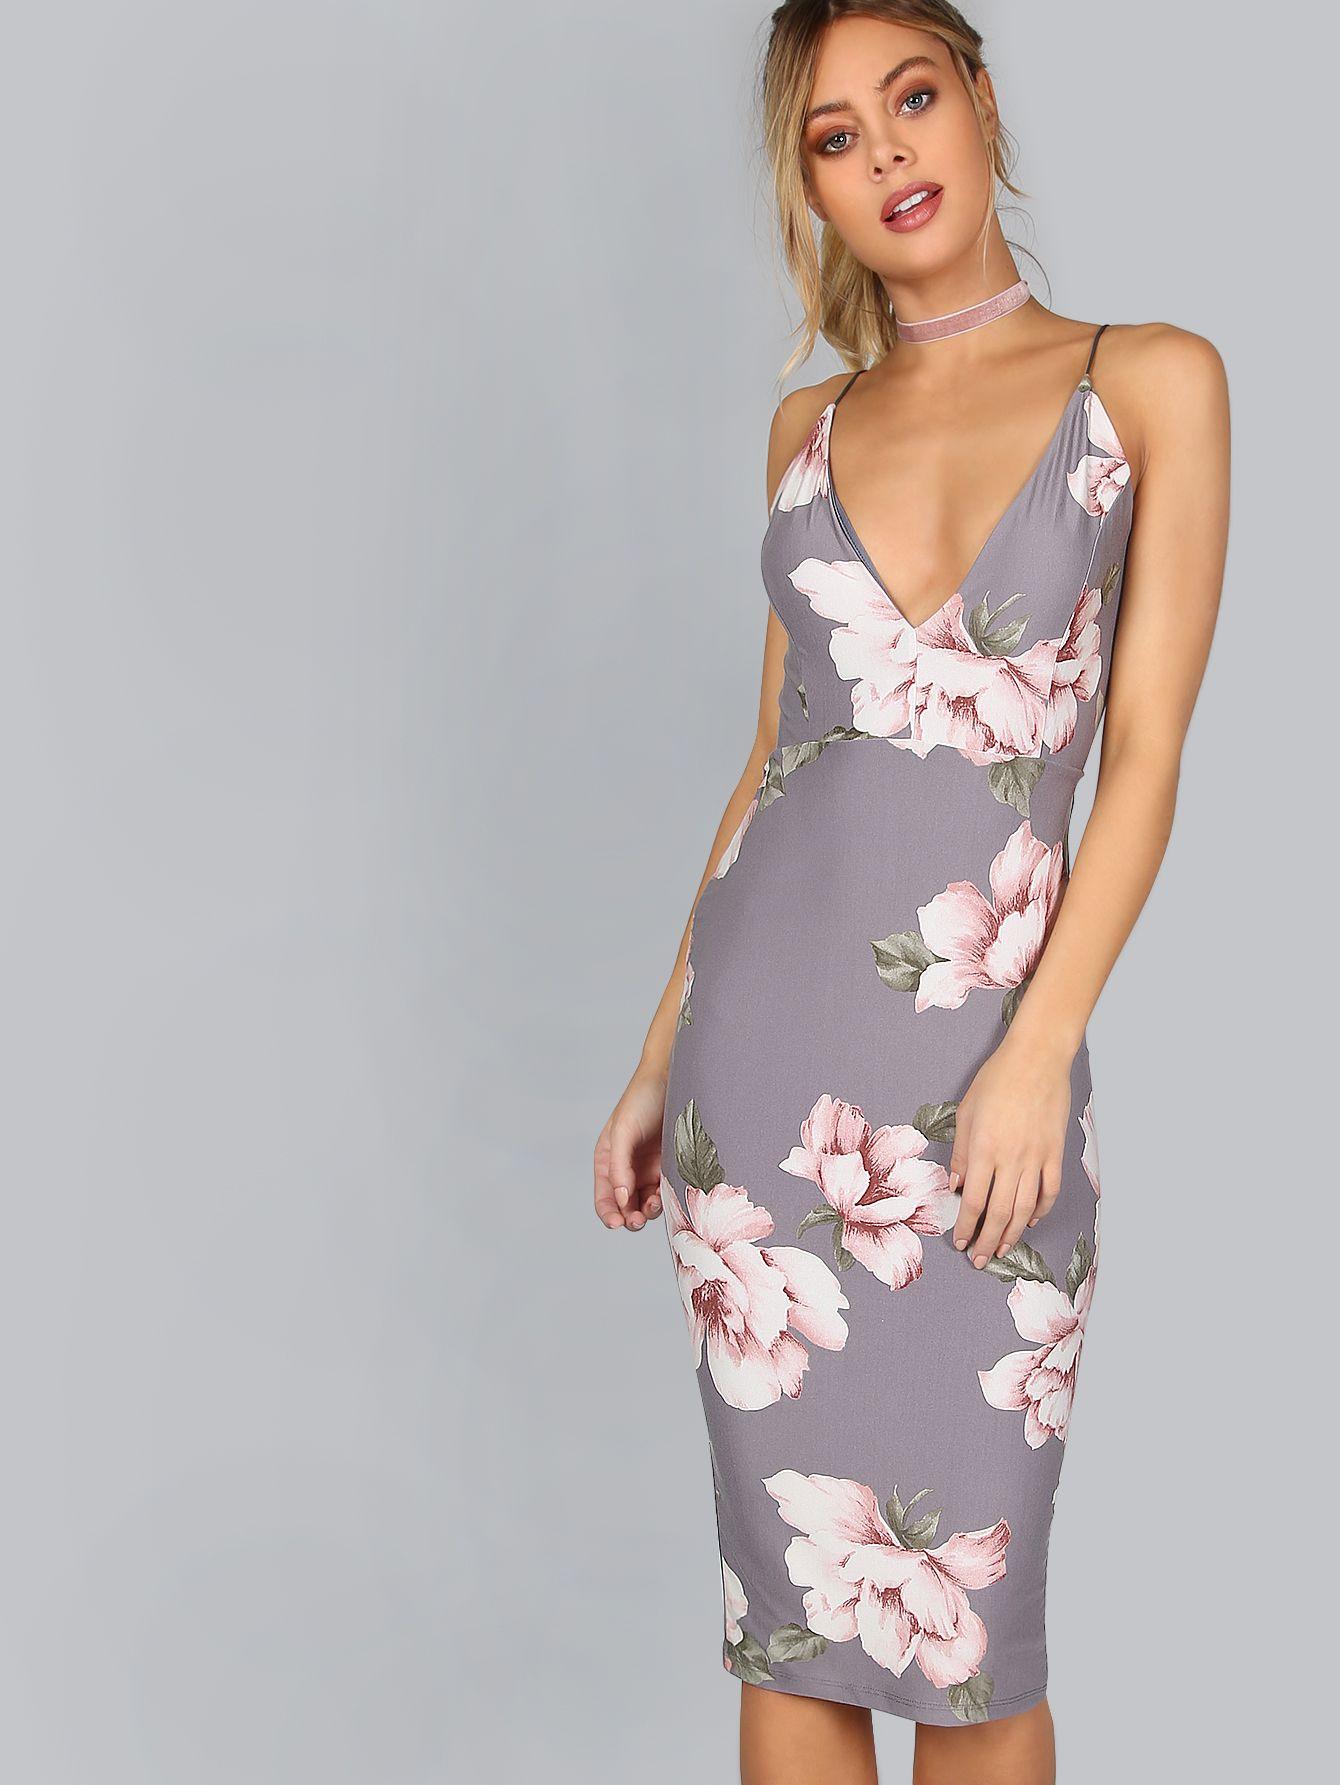 baa2cb04e136 Plunge Neckline Floral Backless Knee Length Dress -SheIn(Sheinside ...